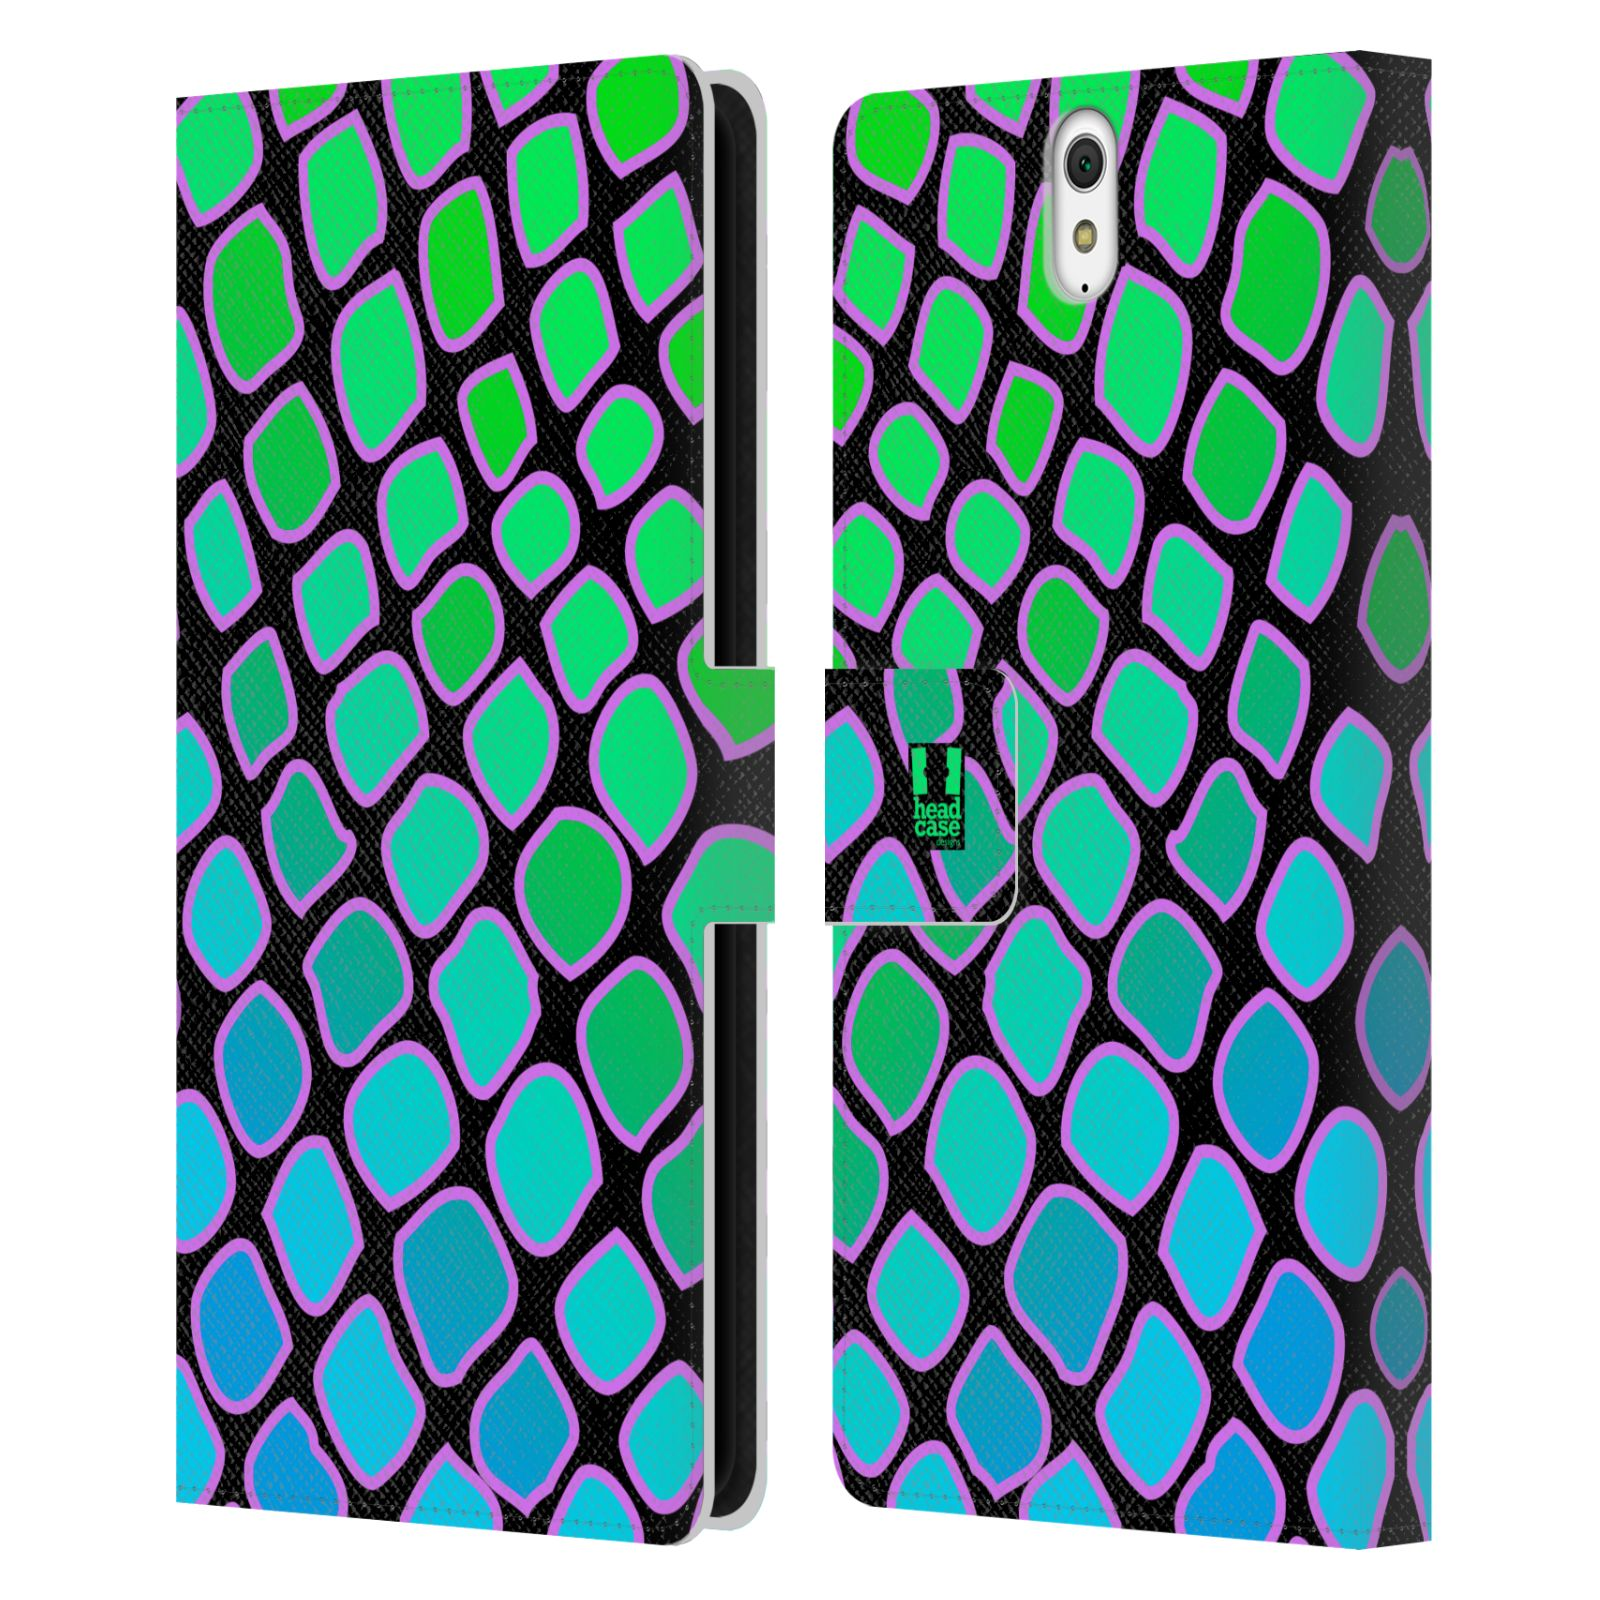 HEAD CASE Flipové pouzdro pro mobil SONY XPERIA C5 Ultra Zvířecí barevné vzory vodní had modrá a zelená barva AQUA